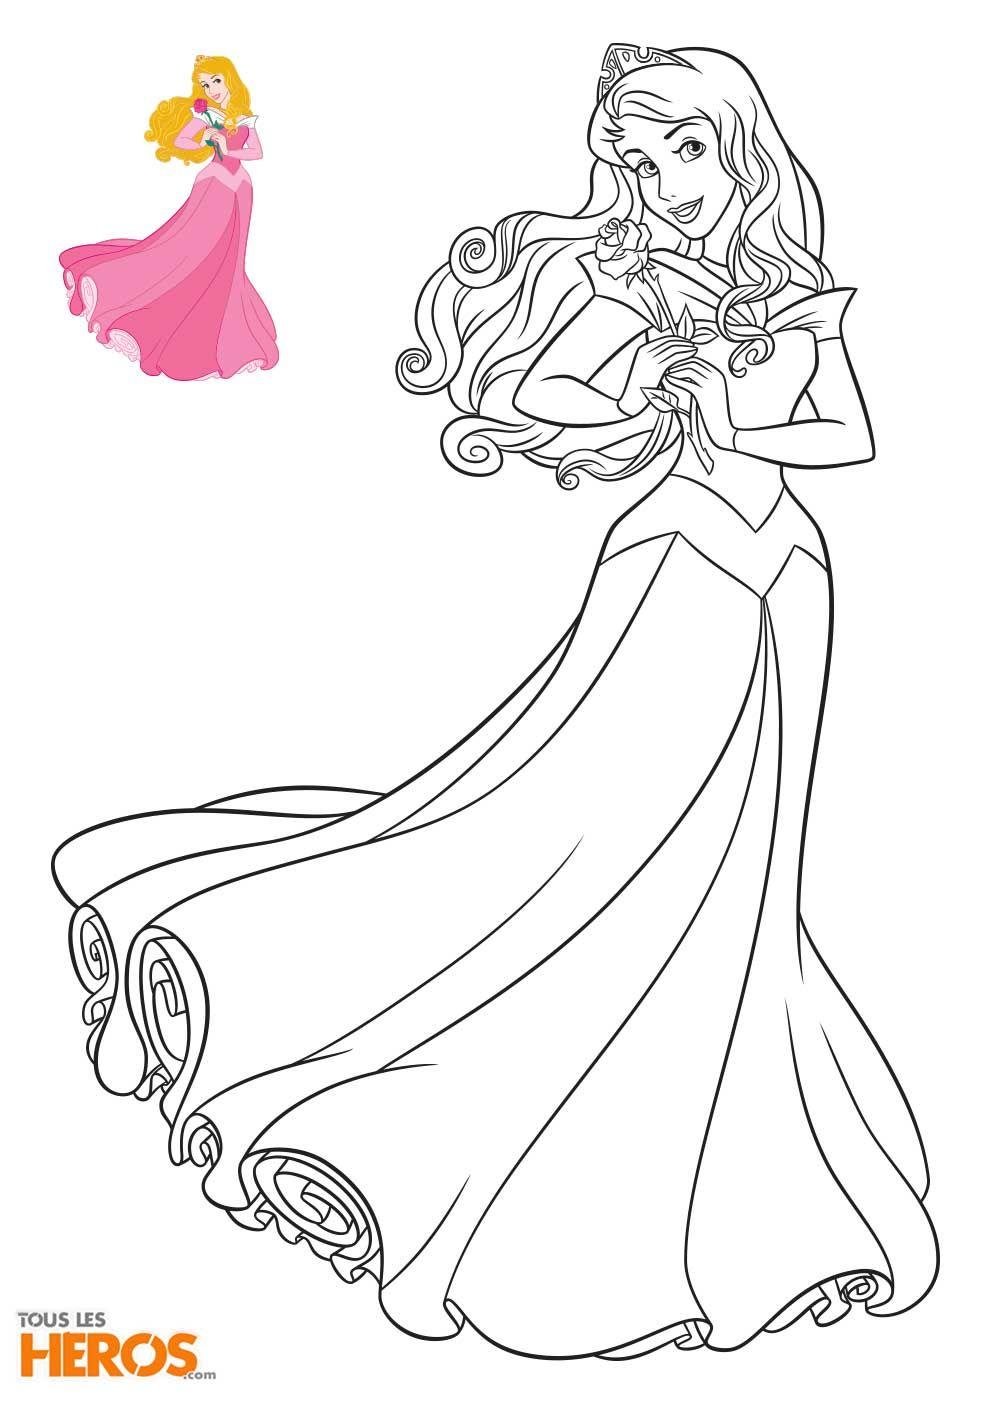 Cool 13 Coloriage Princesses Disney A Imprimer En 2020 Coloriage Princesse Coloriage Princesse Disney Coloriage A Imprimer Disney